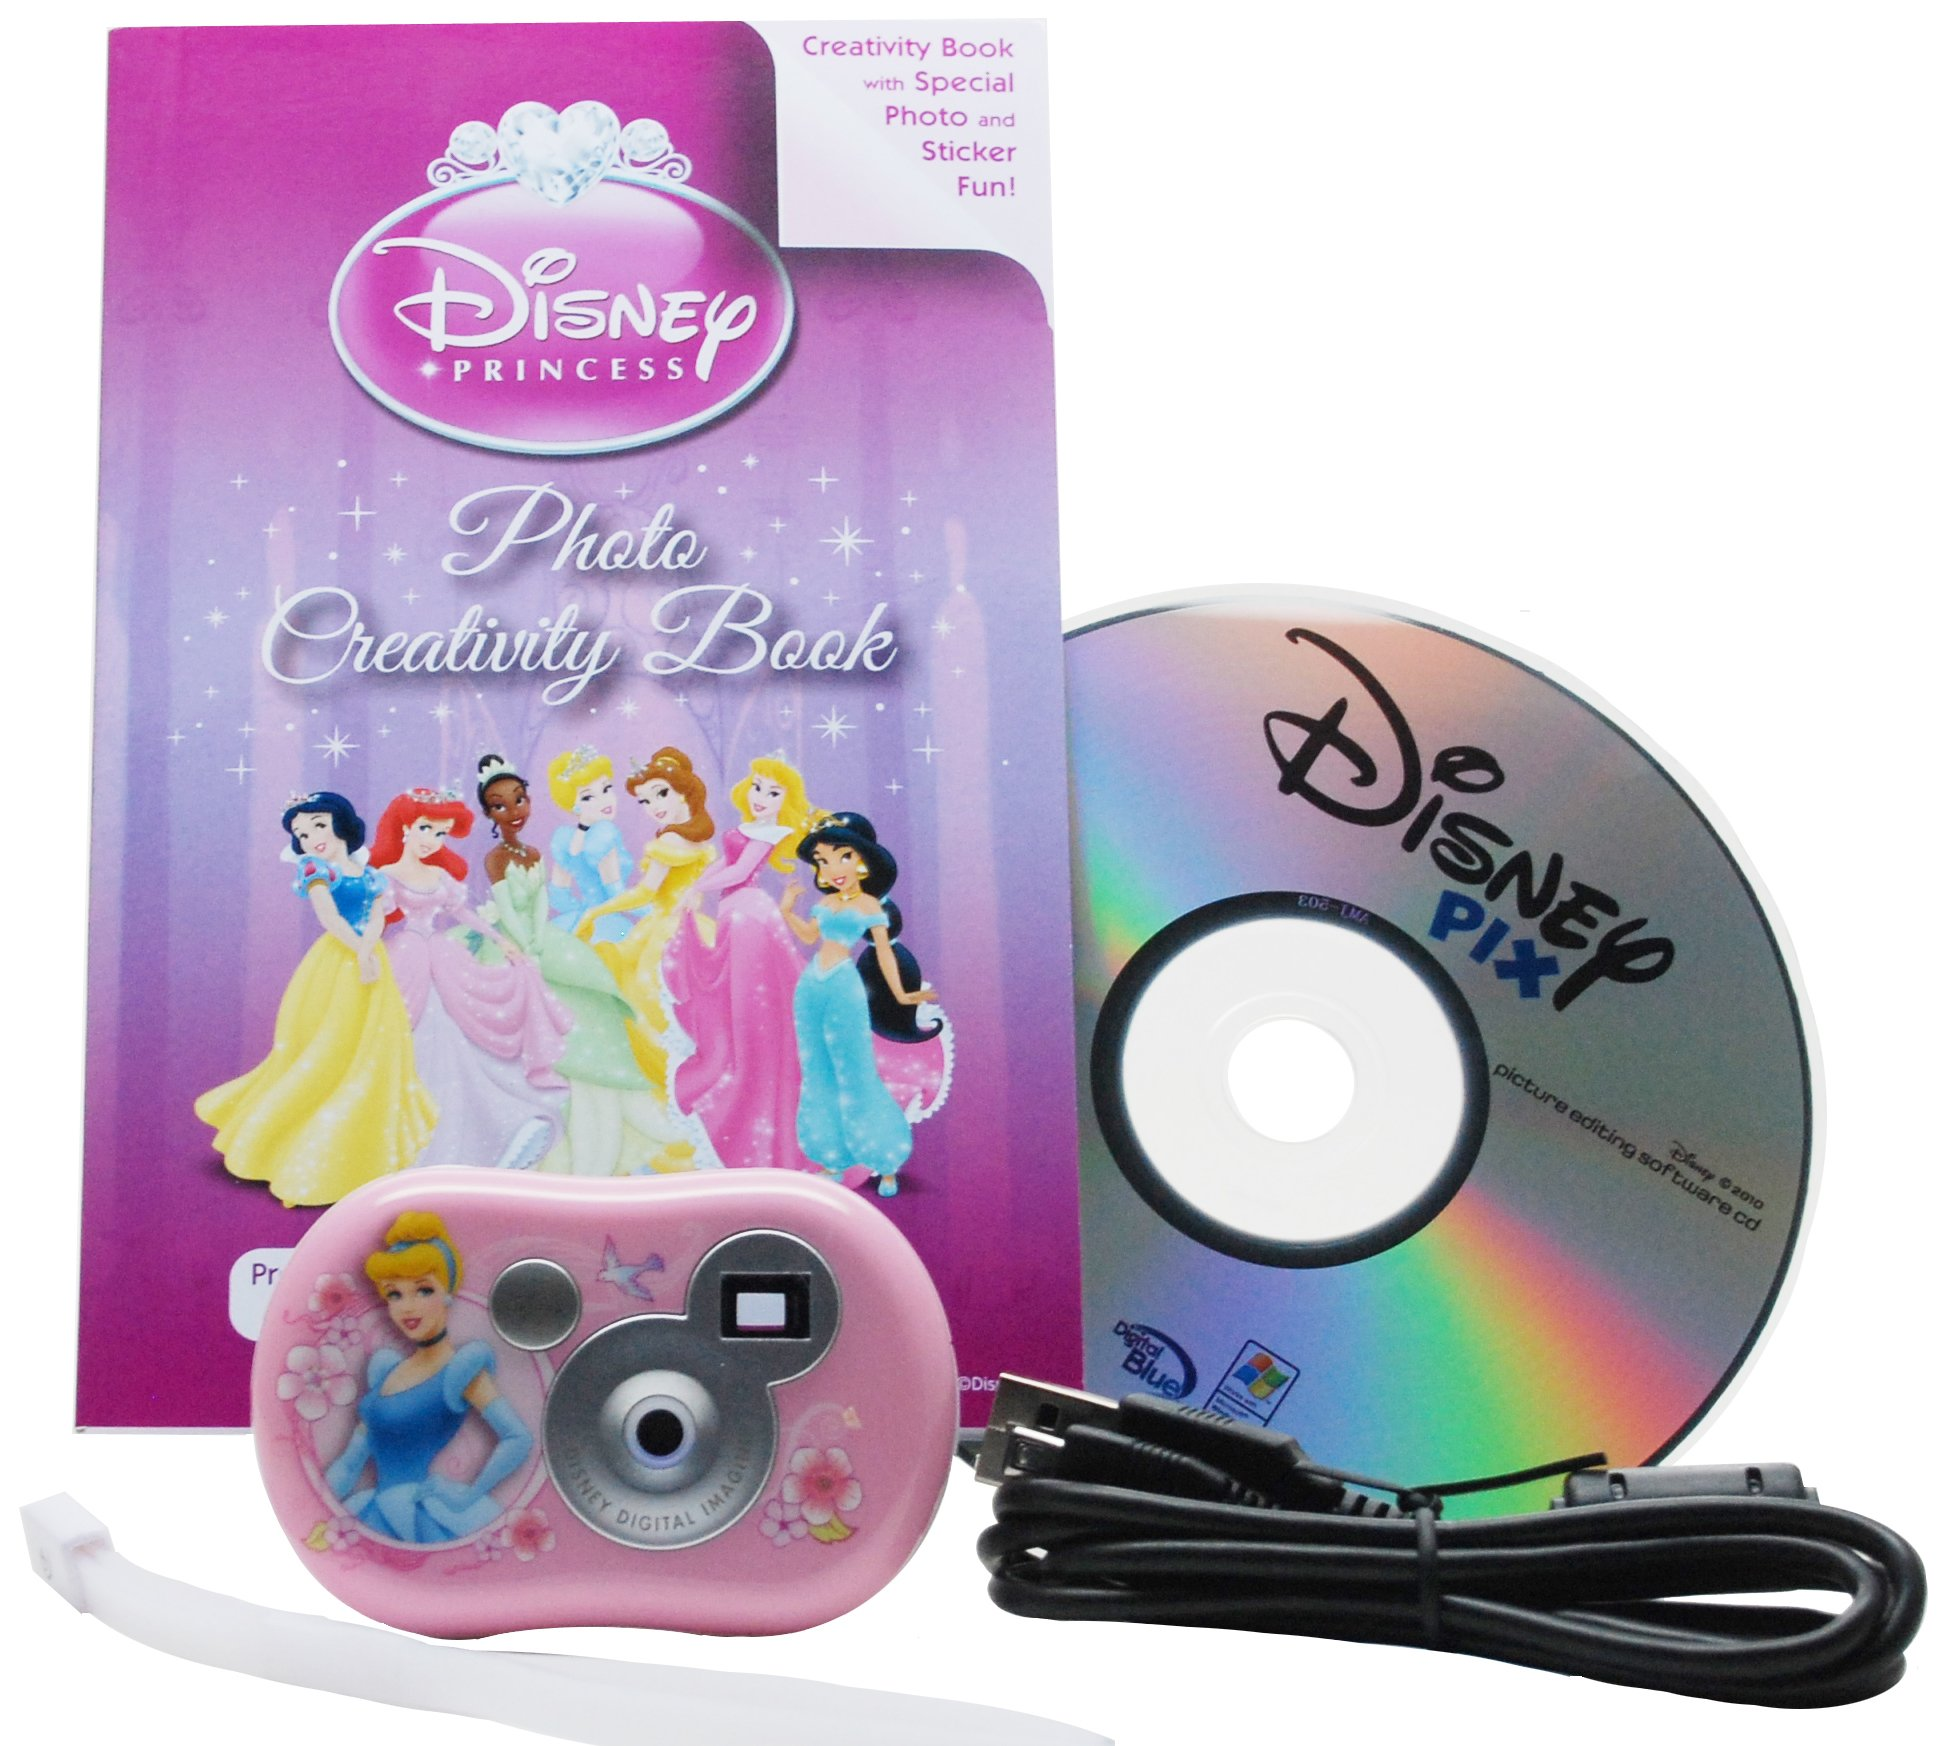 Digital Blue Disney Pix Camera Click Creativity Kit - Disney Princess by Digital Blue (Image #1)